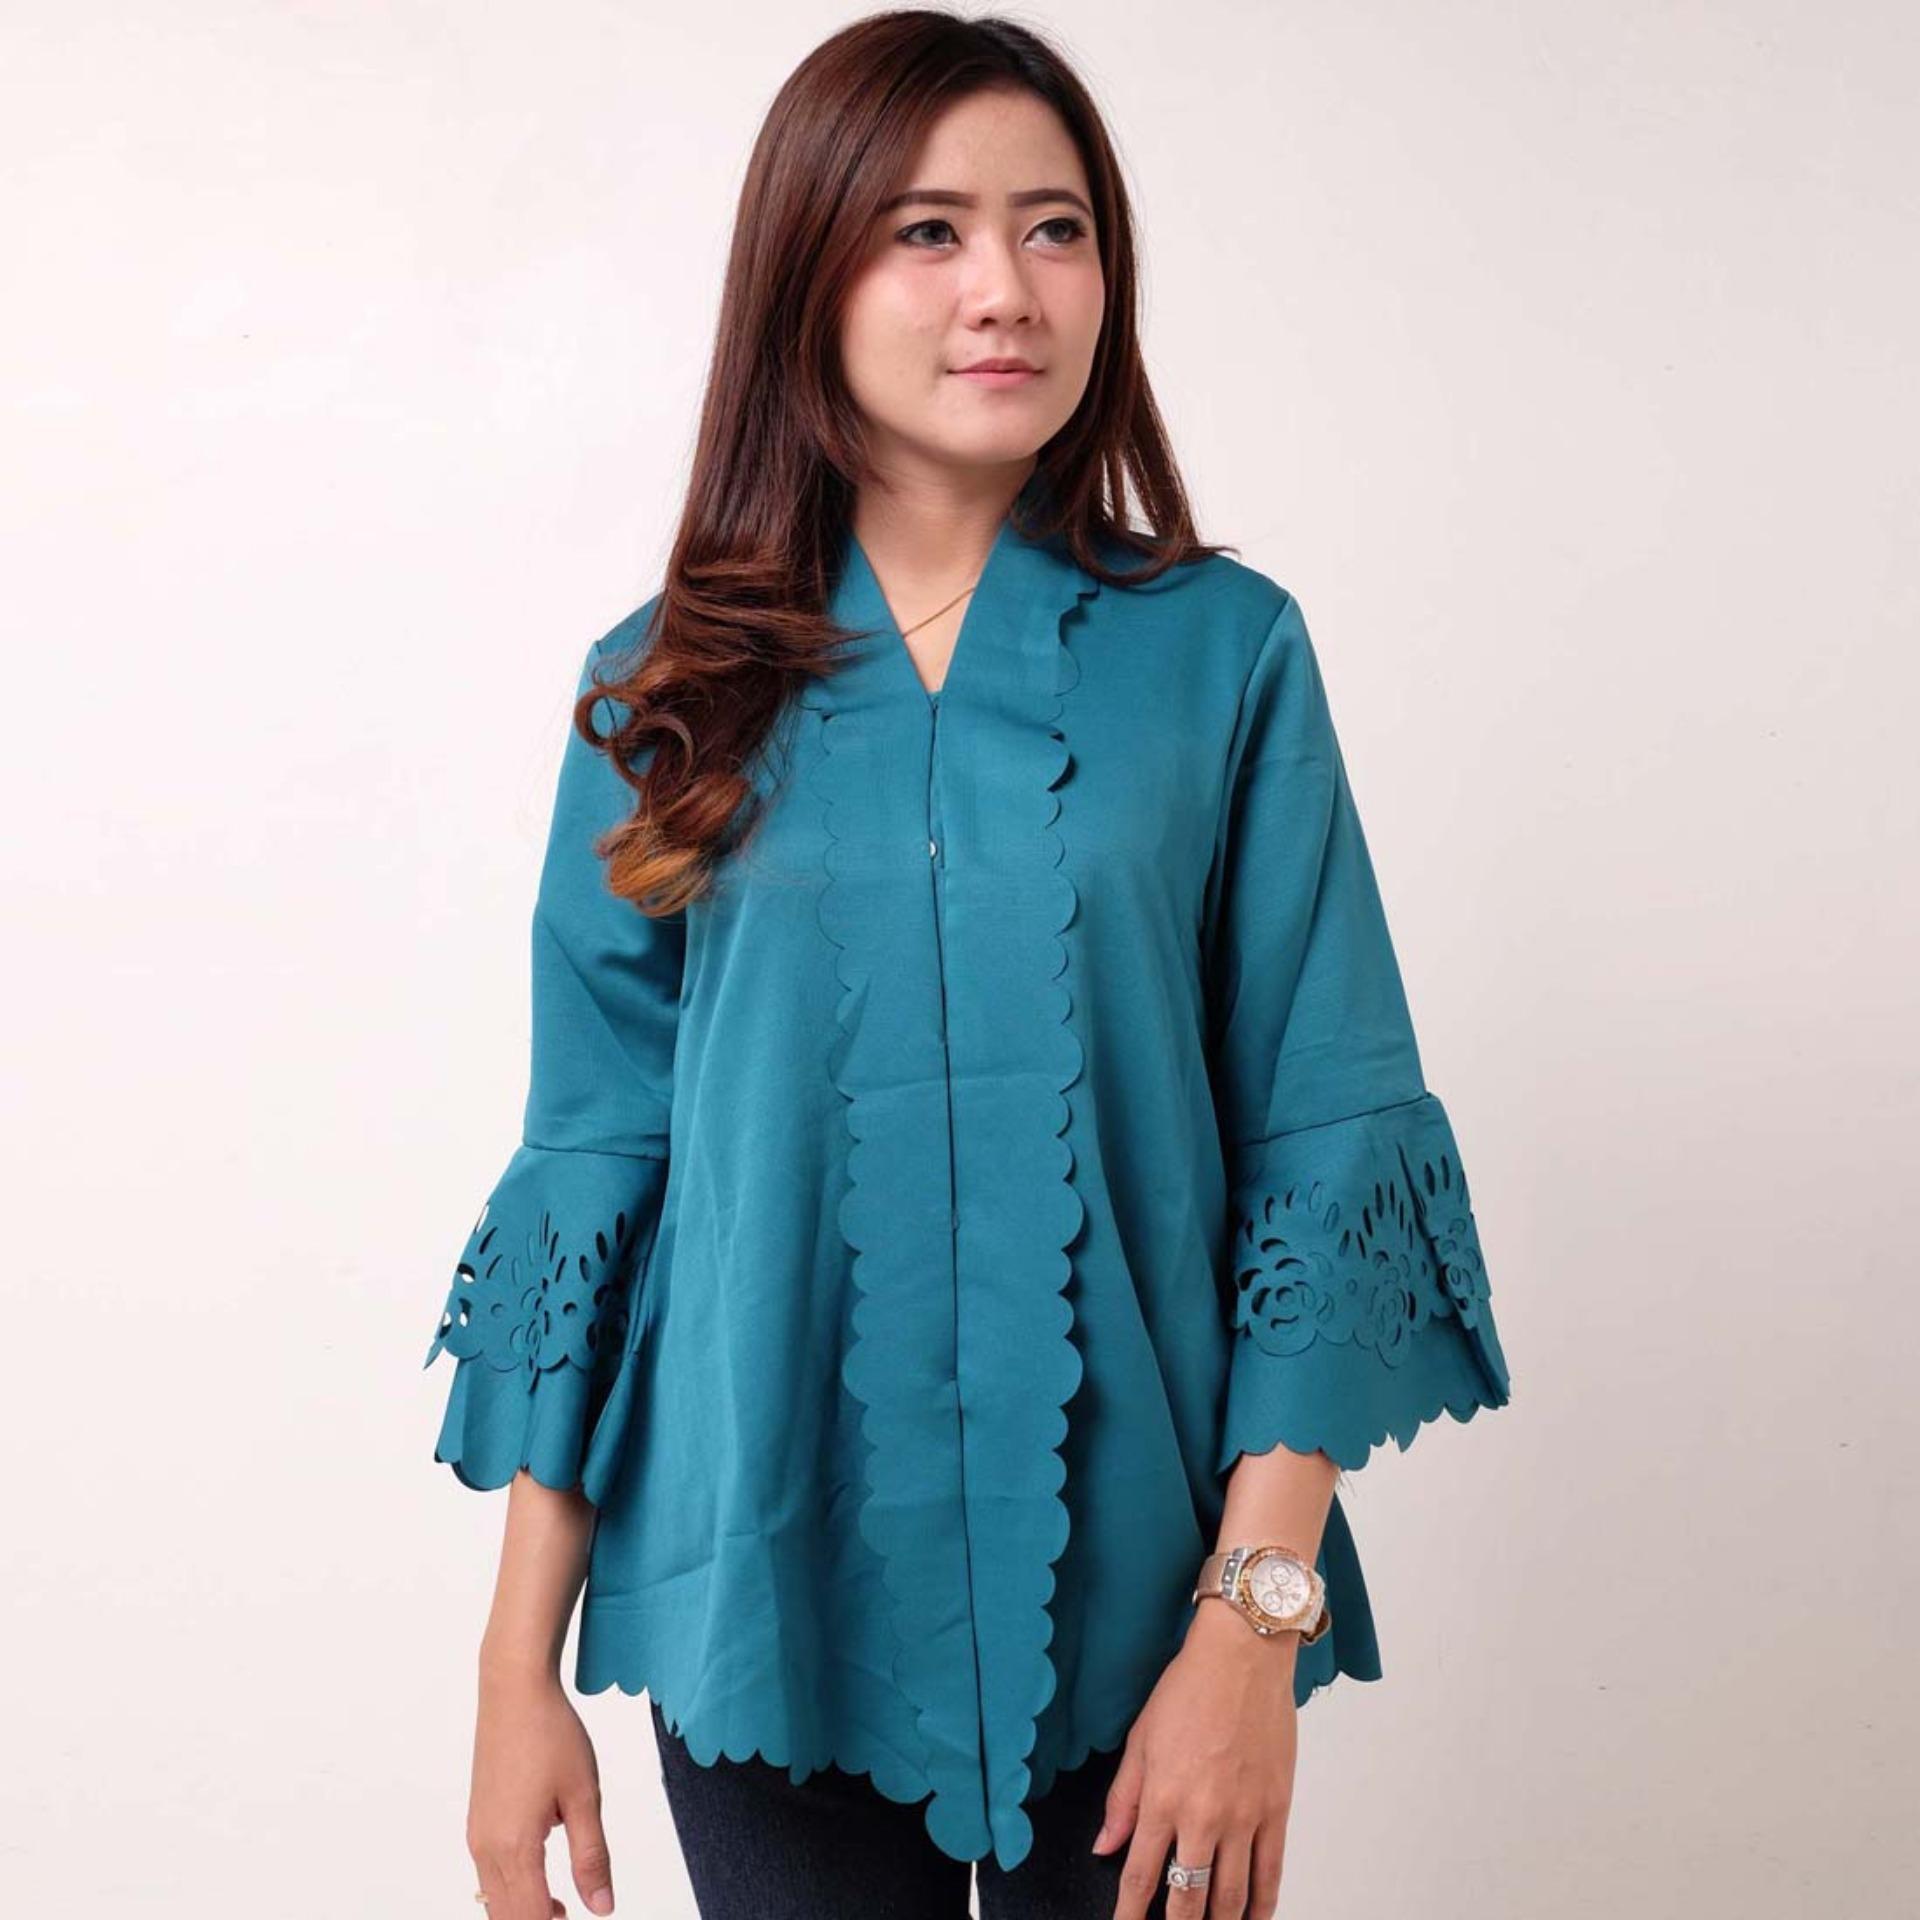 Batik Distro BA9089 Kebaya Wanita Encim Polos - Biru